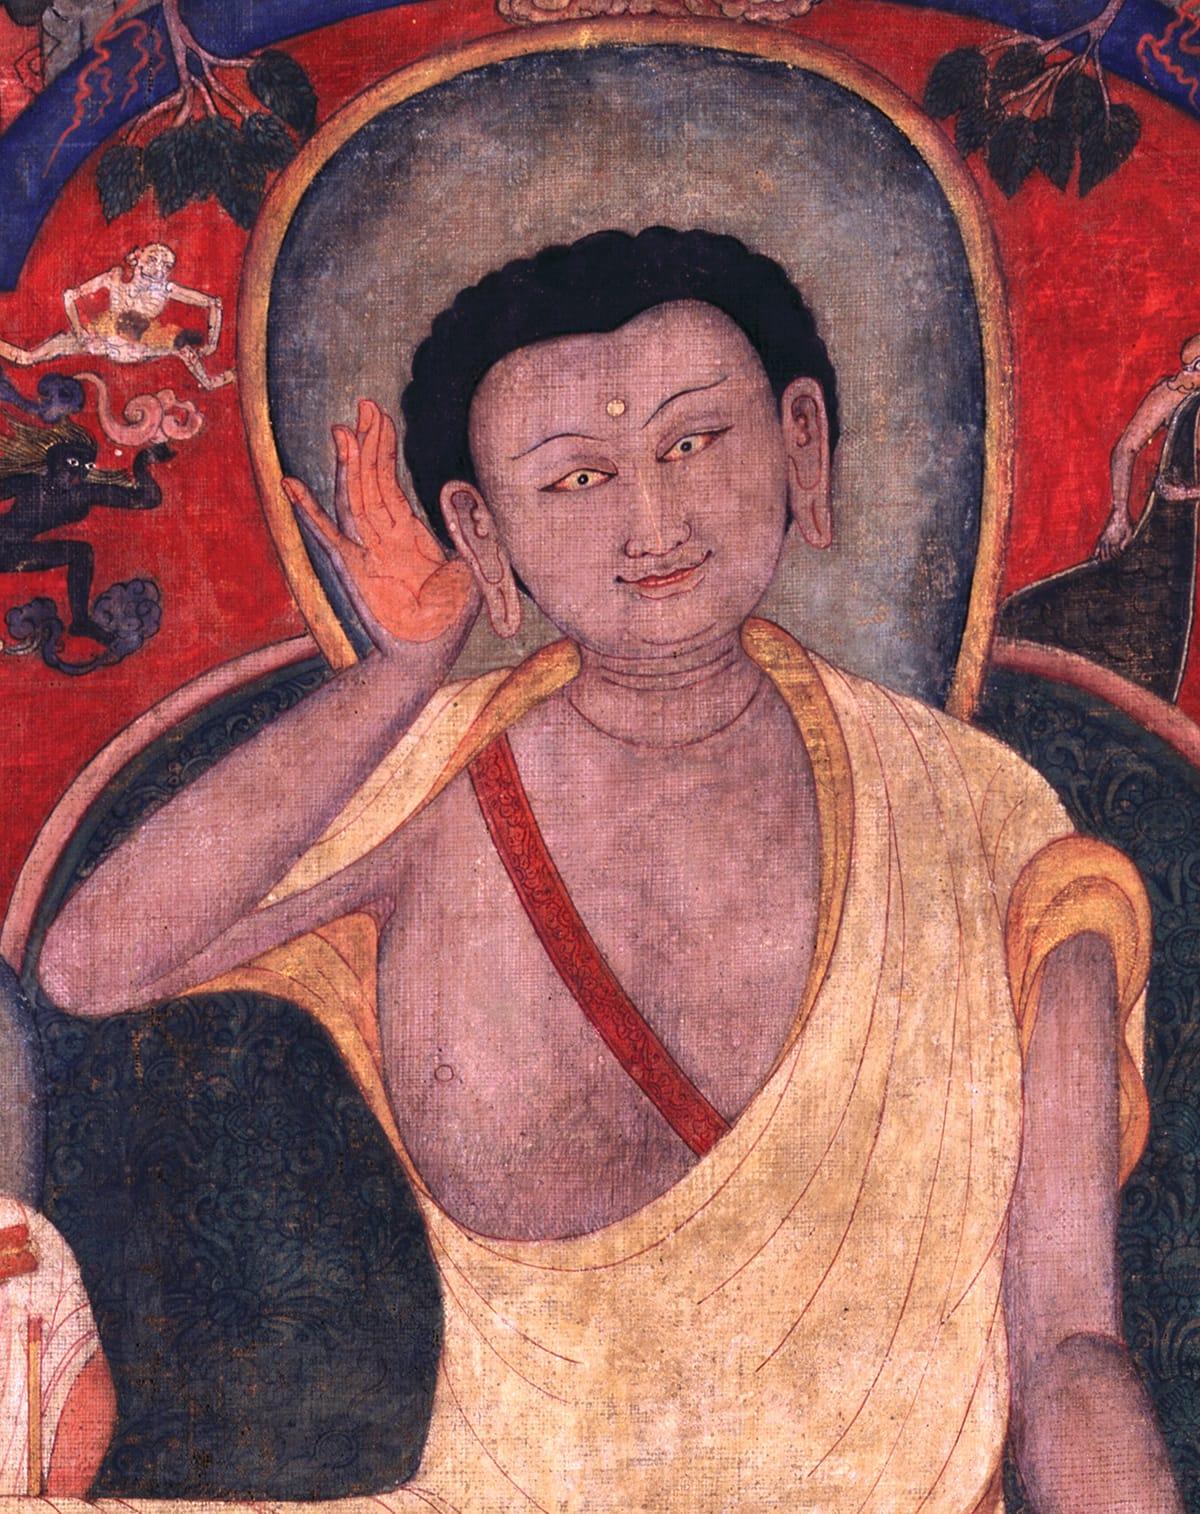 Buddhadharma - Spring '14 Eight Bardos Khenchen Konchog Gyaltshen Milarepa Song of Realization